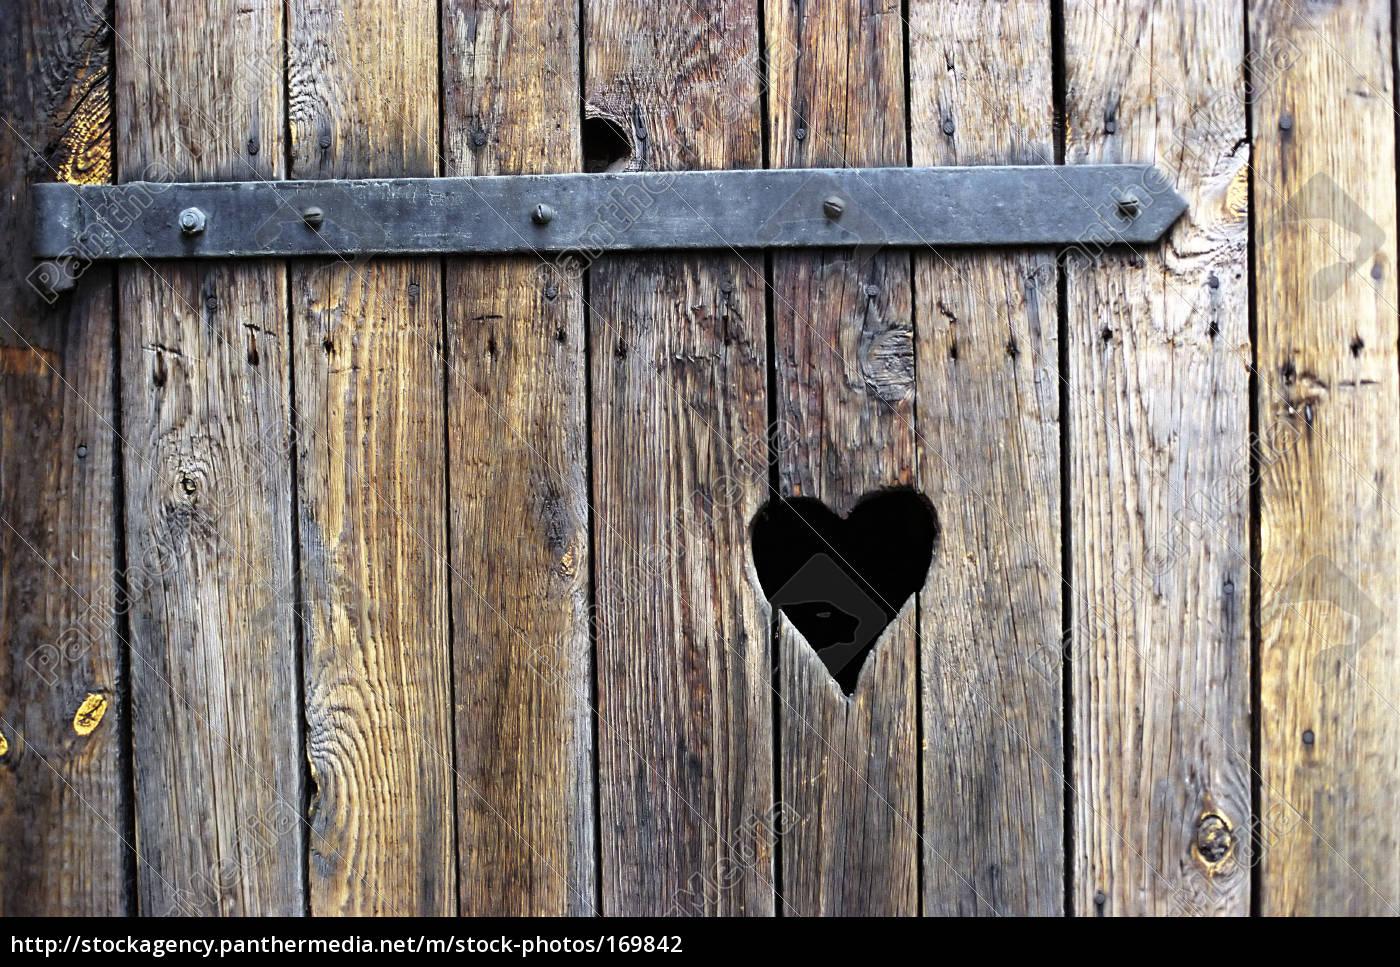 heart, cottage - 169842